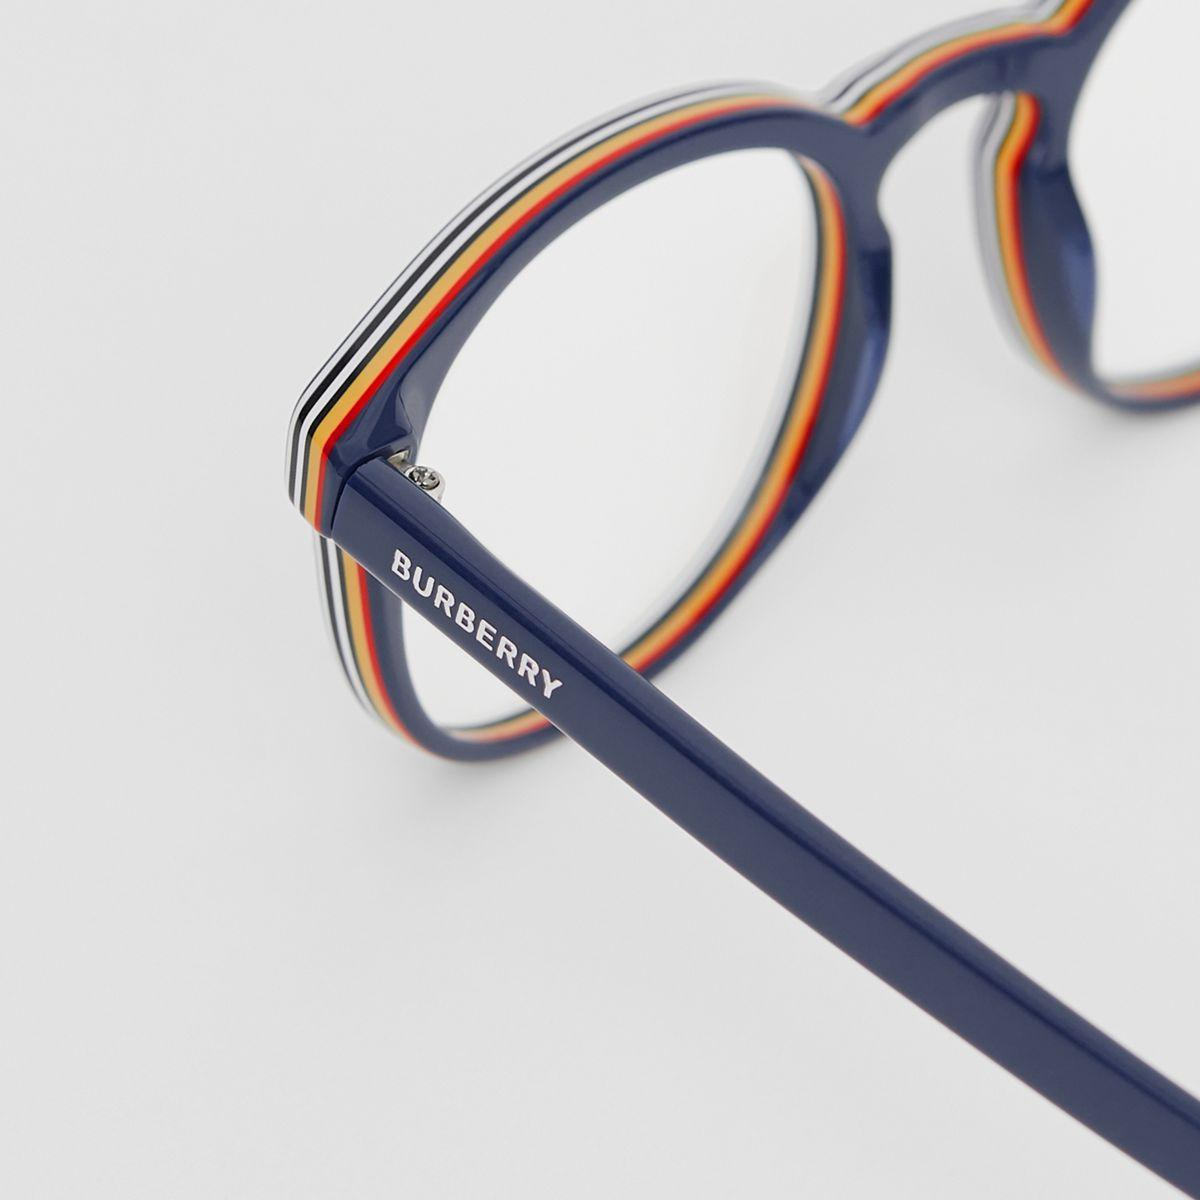 d485d5ecb58 Burberry - Blue Icon Stripe Detail Round Optical Frames for Men - Lyst.  View fullscreen